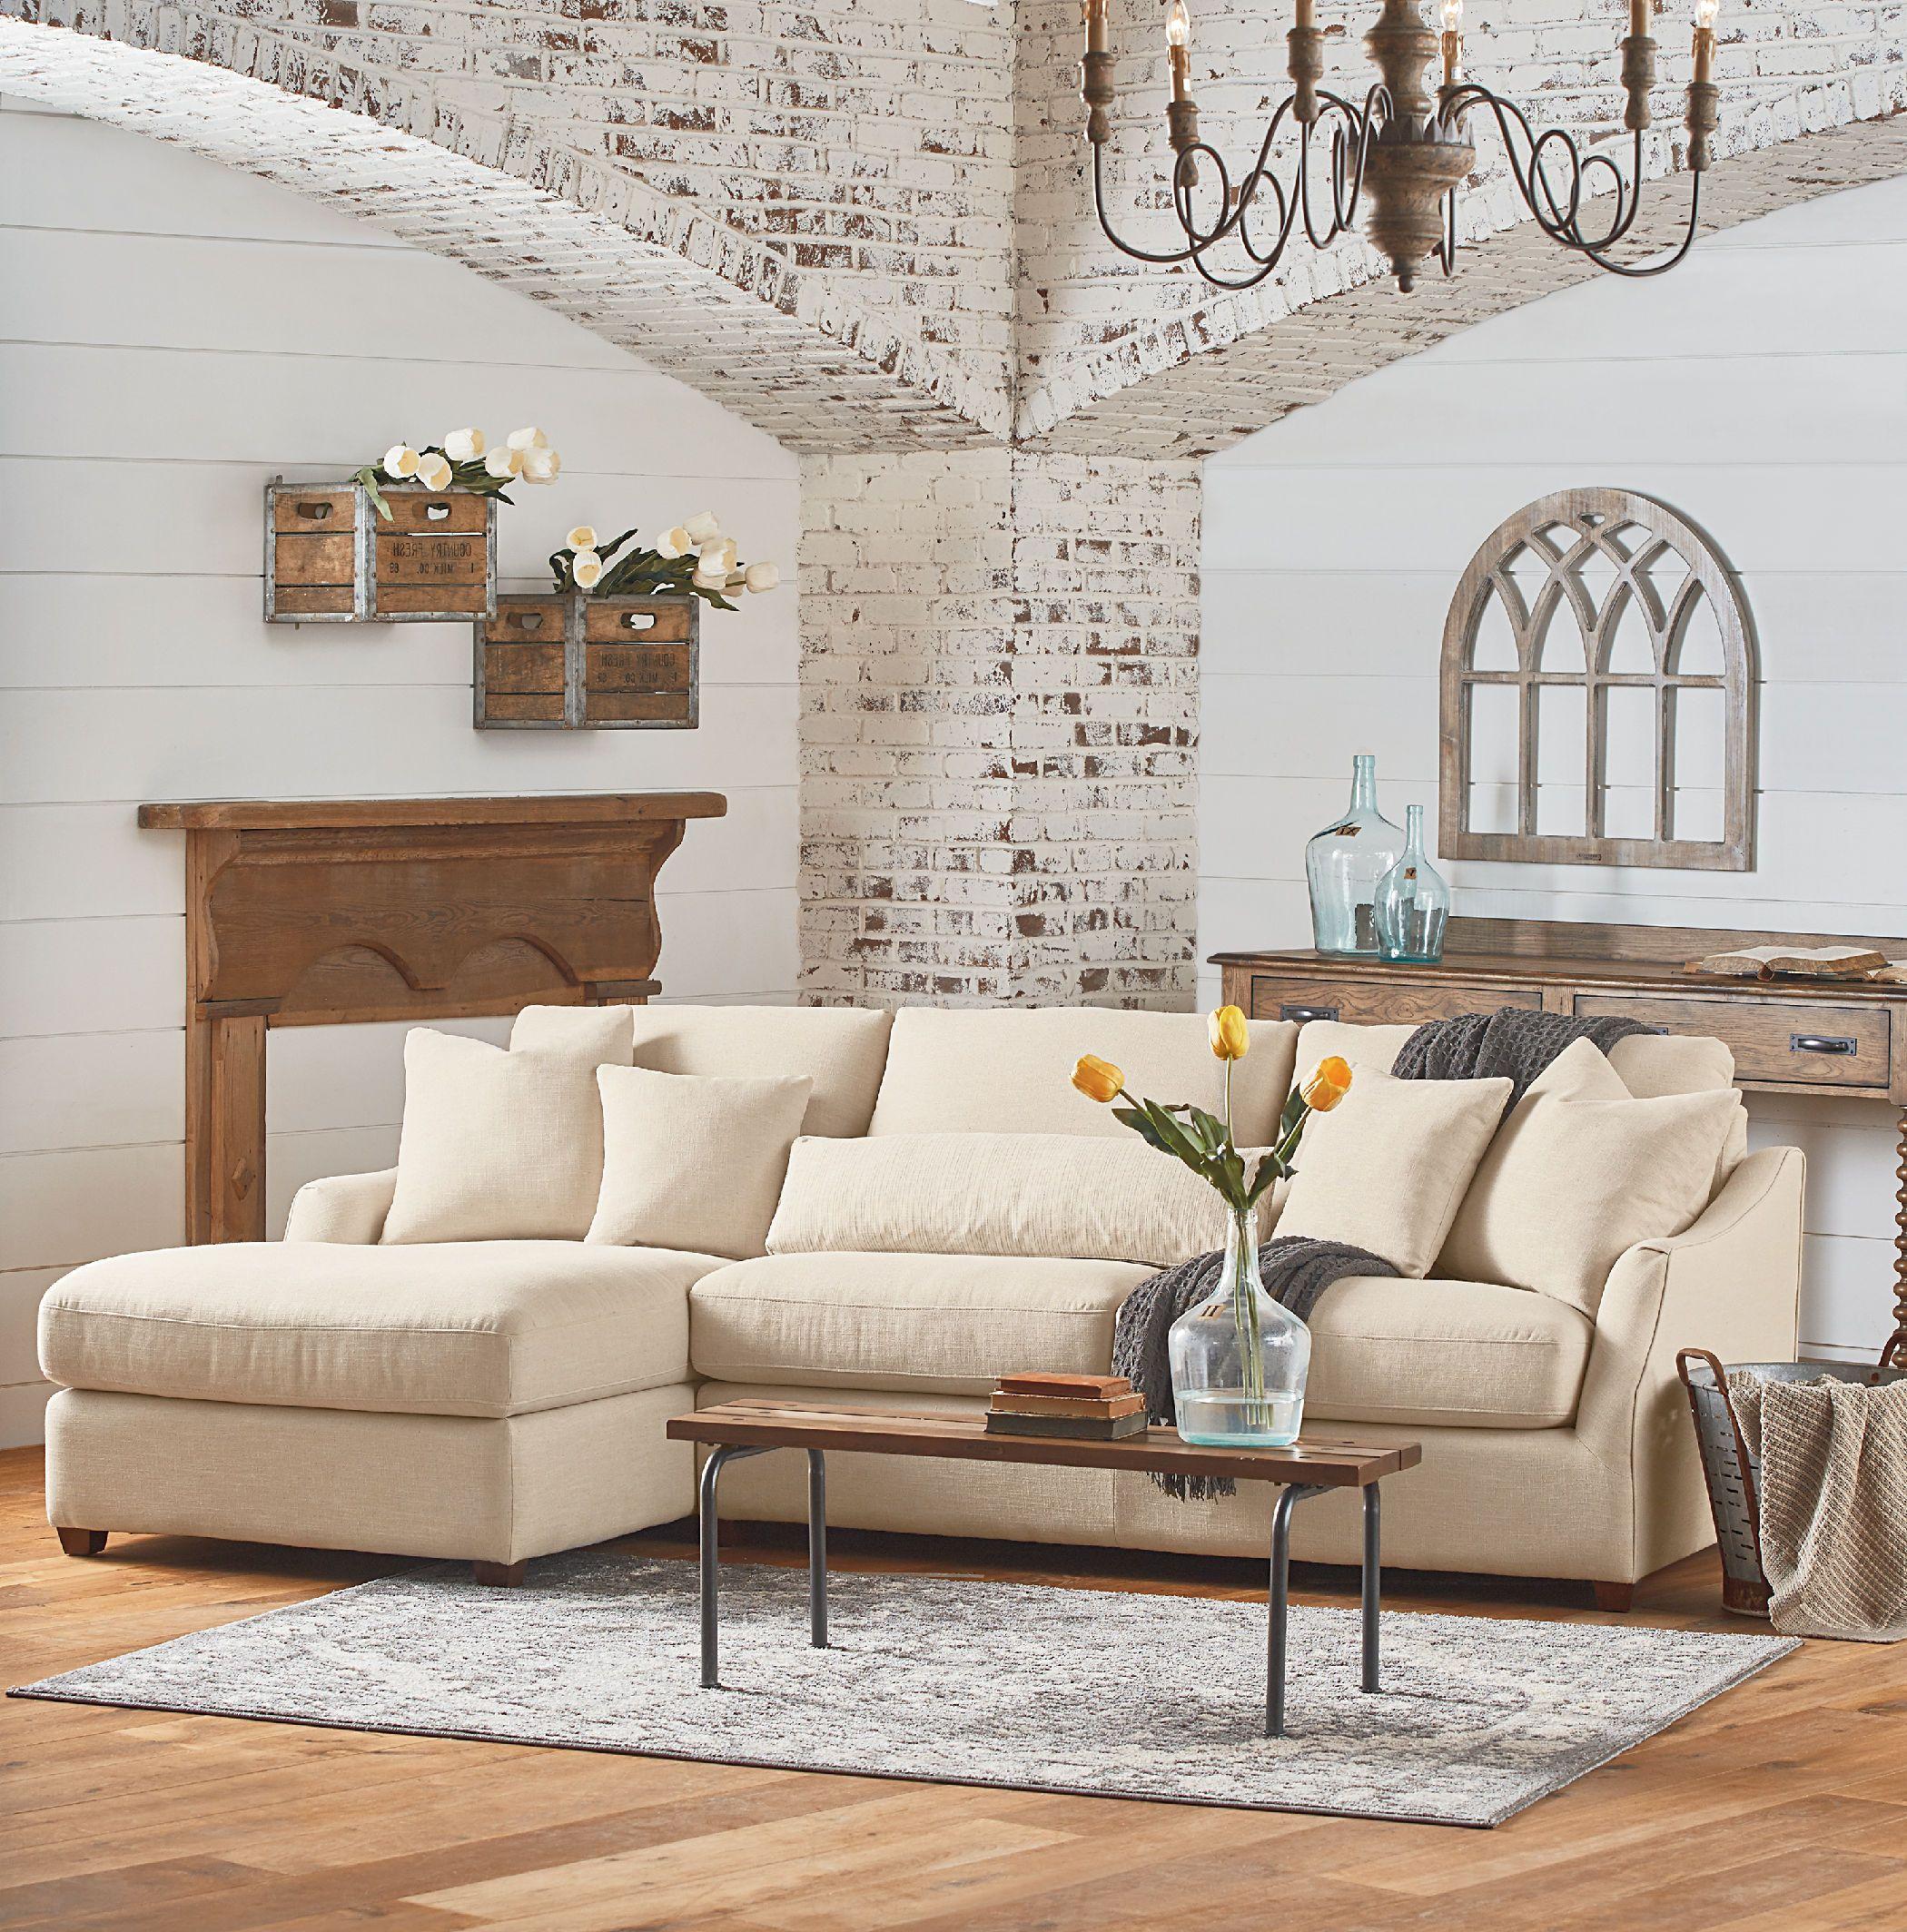 Magnolia home homestead piece laf chaise sofa kt living